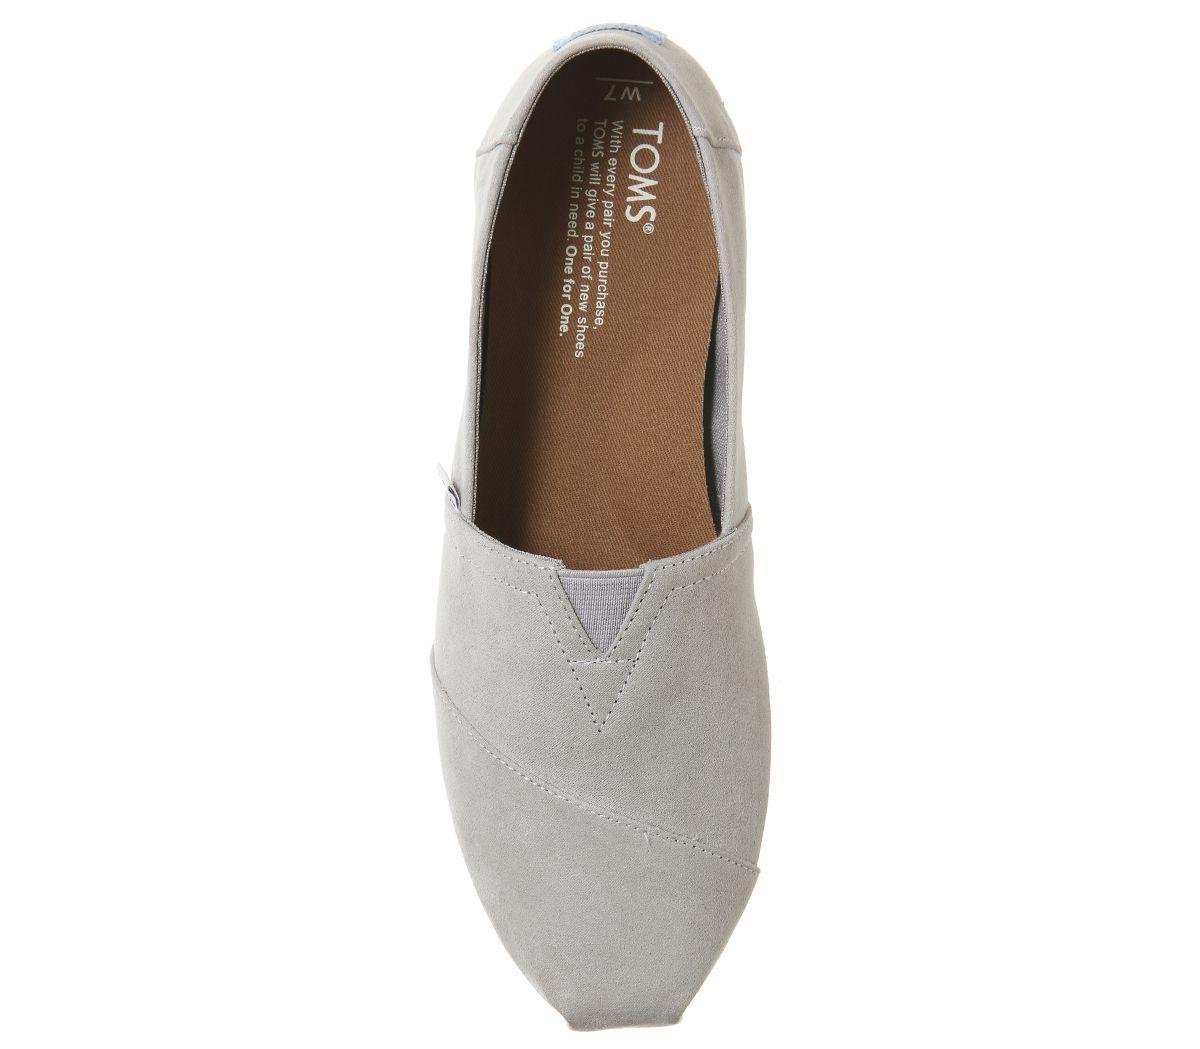 Womens-Toms-Seasonal-Classic-Slip-On-Drizzle-Grey-Flats thumbnail 13